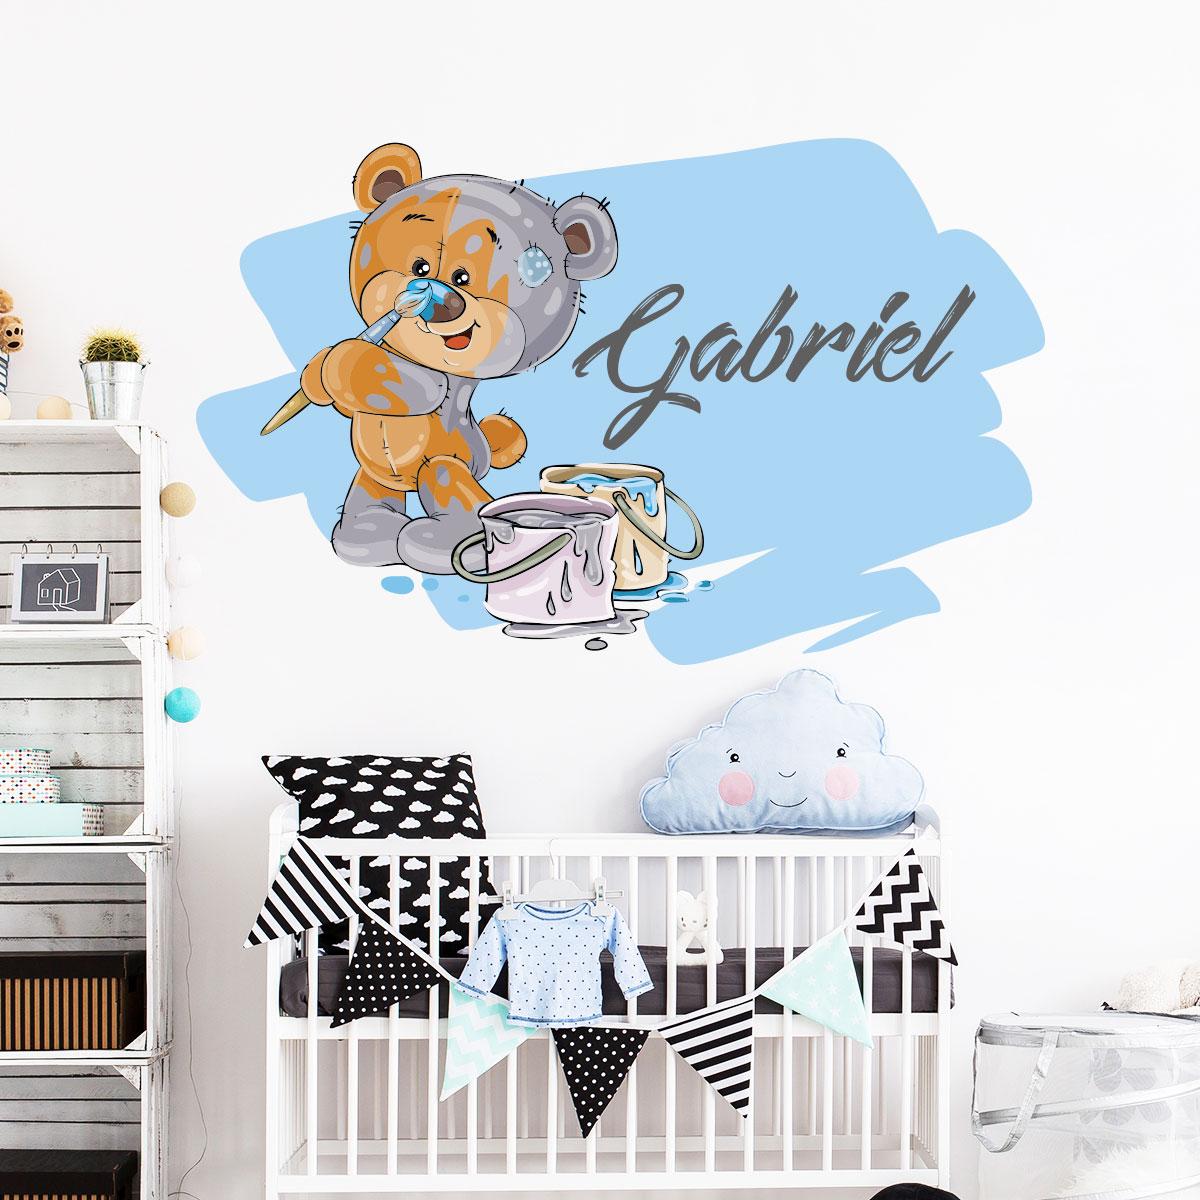 Sticker pr nom personnalis ourson en peluche stickers chambre enfants chambre b b ambiance - Stickers muraux personnalise ...